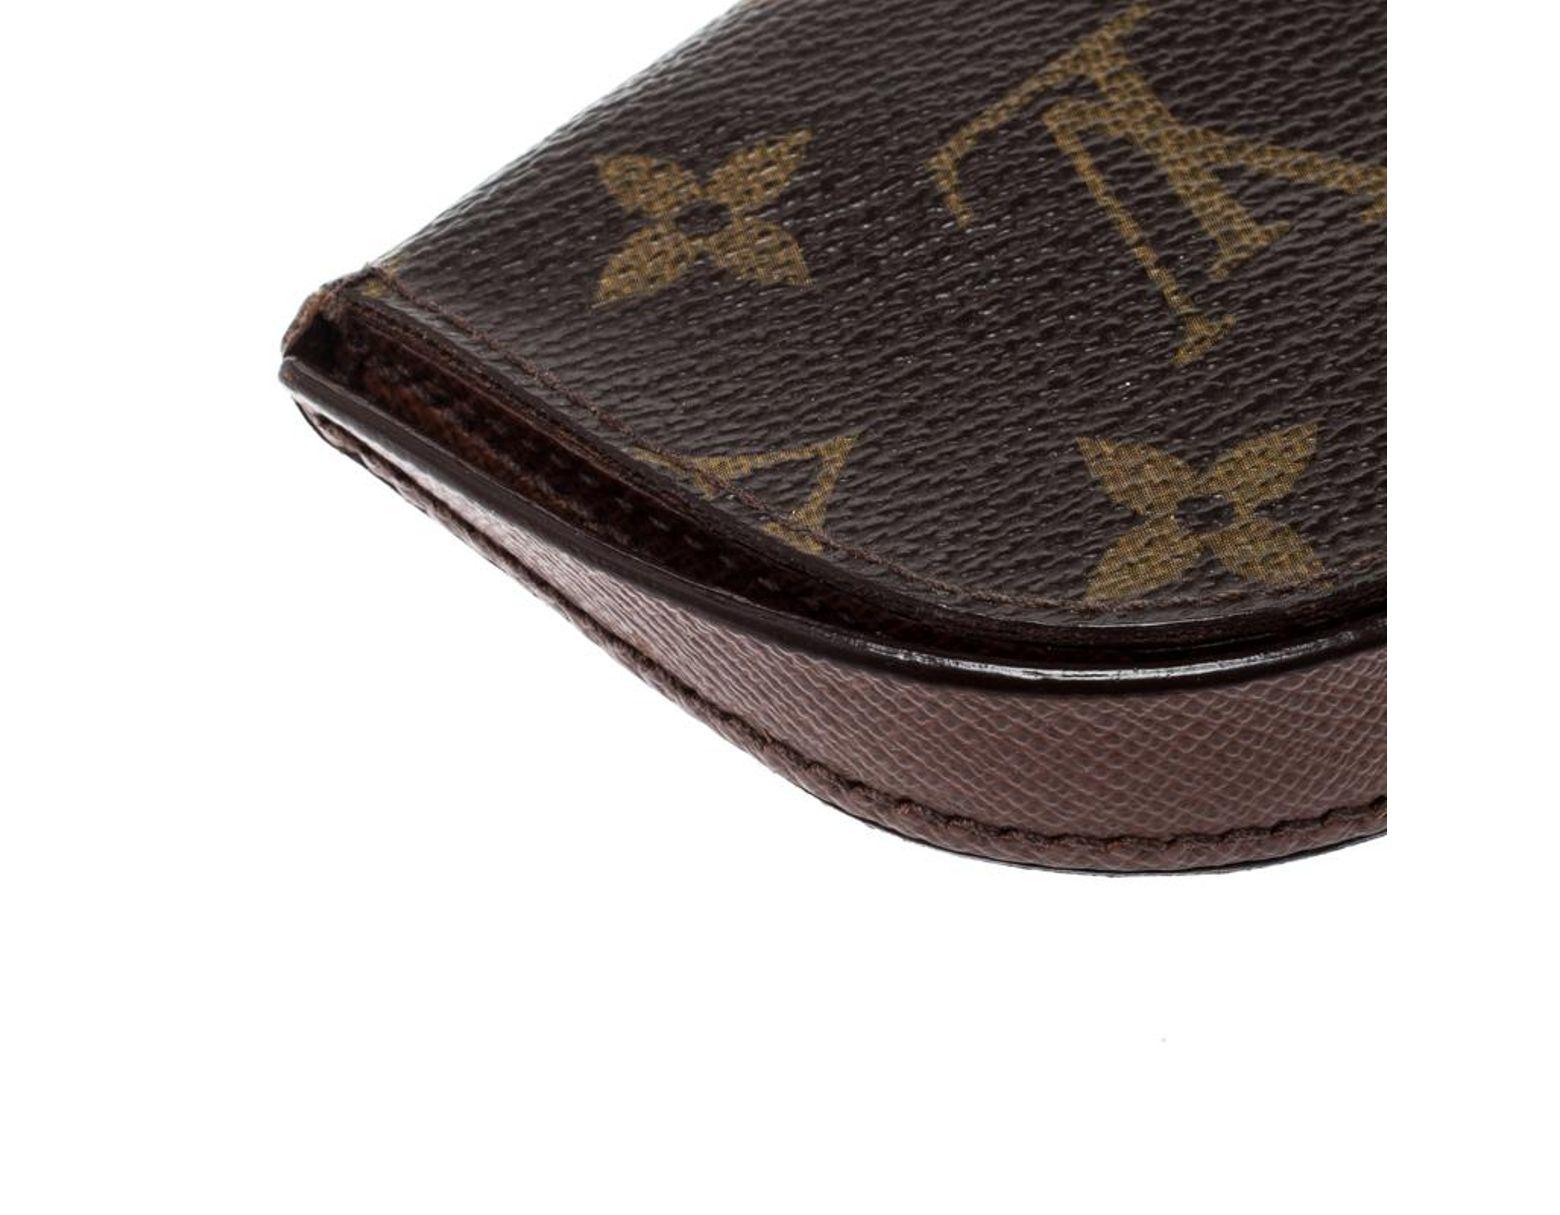 c346df83535 Louis Vuitton Monogram Canvas Porte Monnaie Gousset Coin Purse in ...